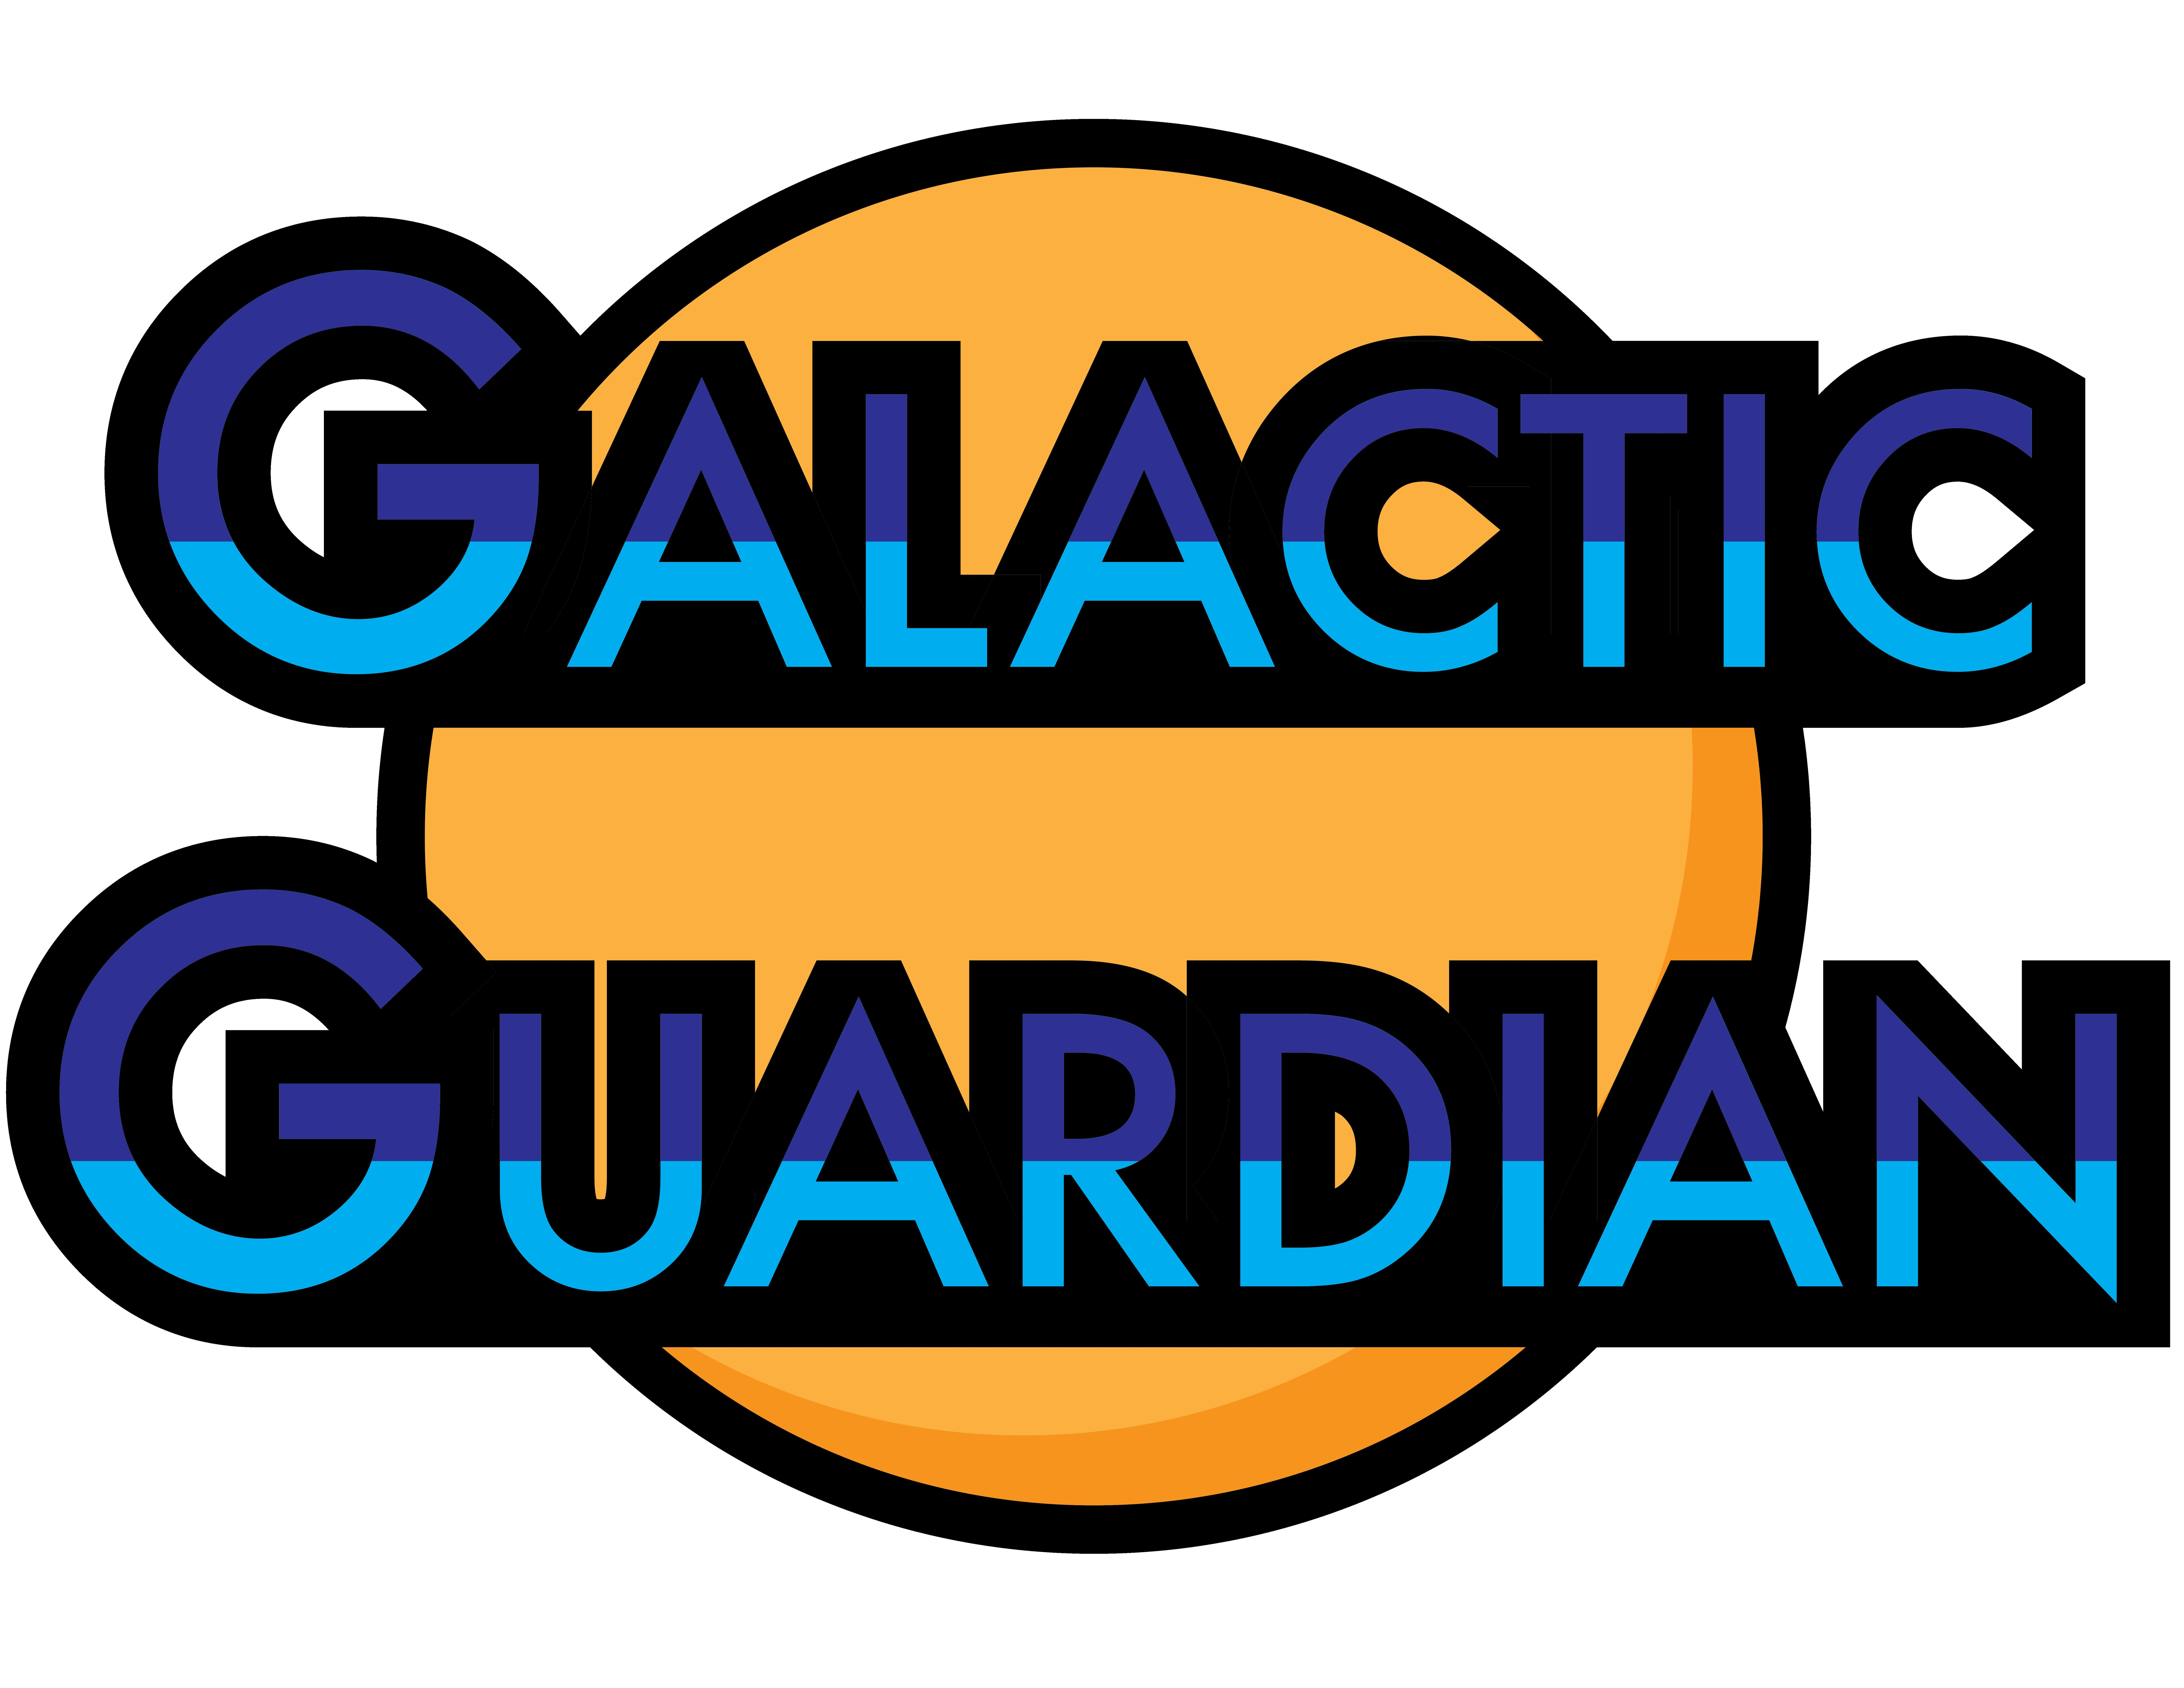 Galactic Guardian